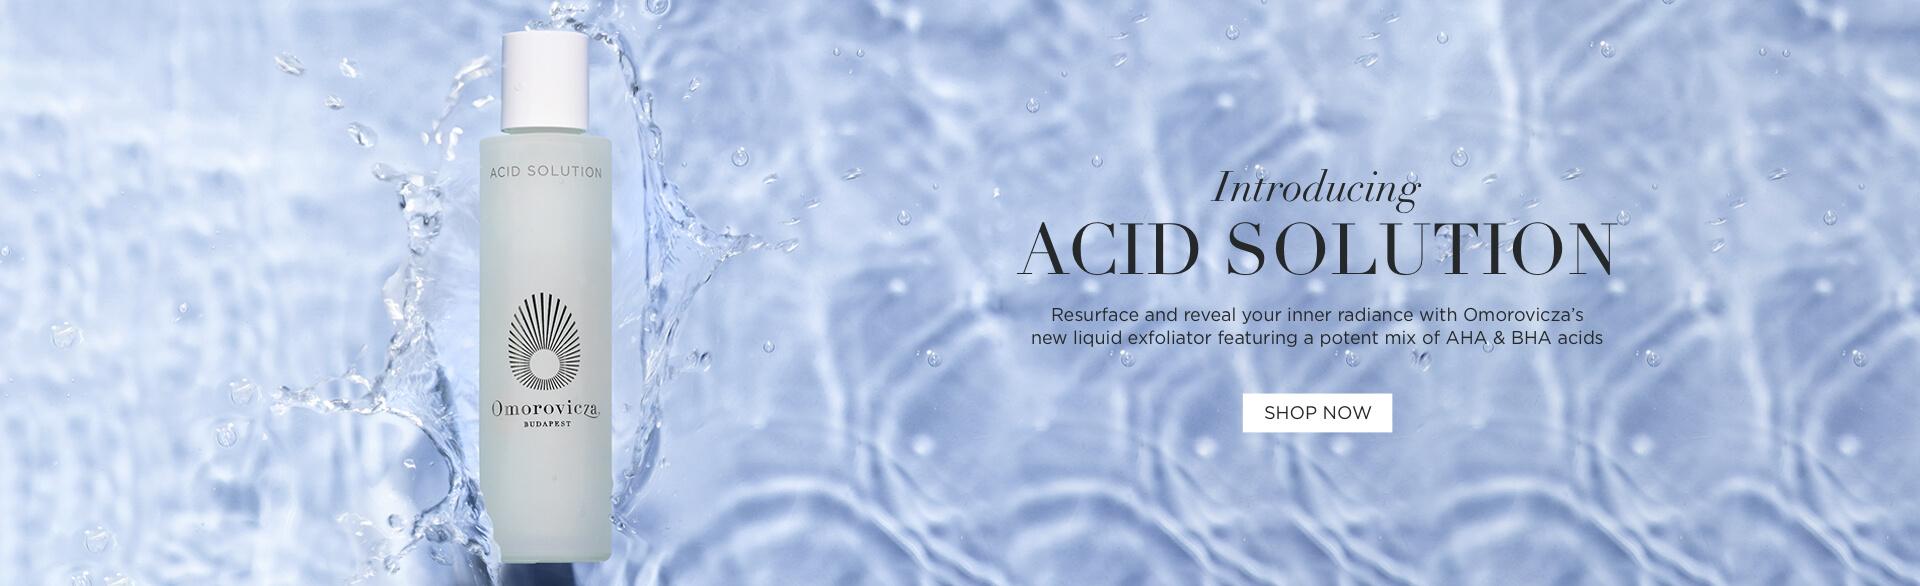 Introducting Acid Solution